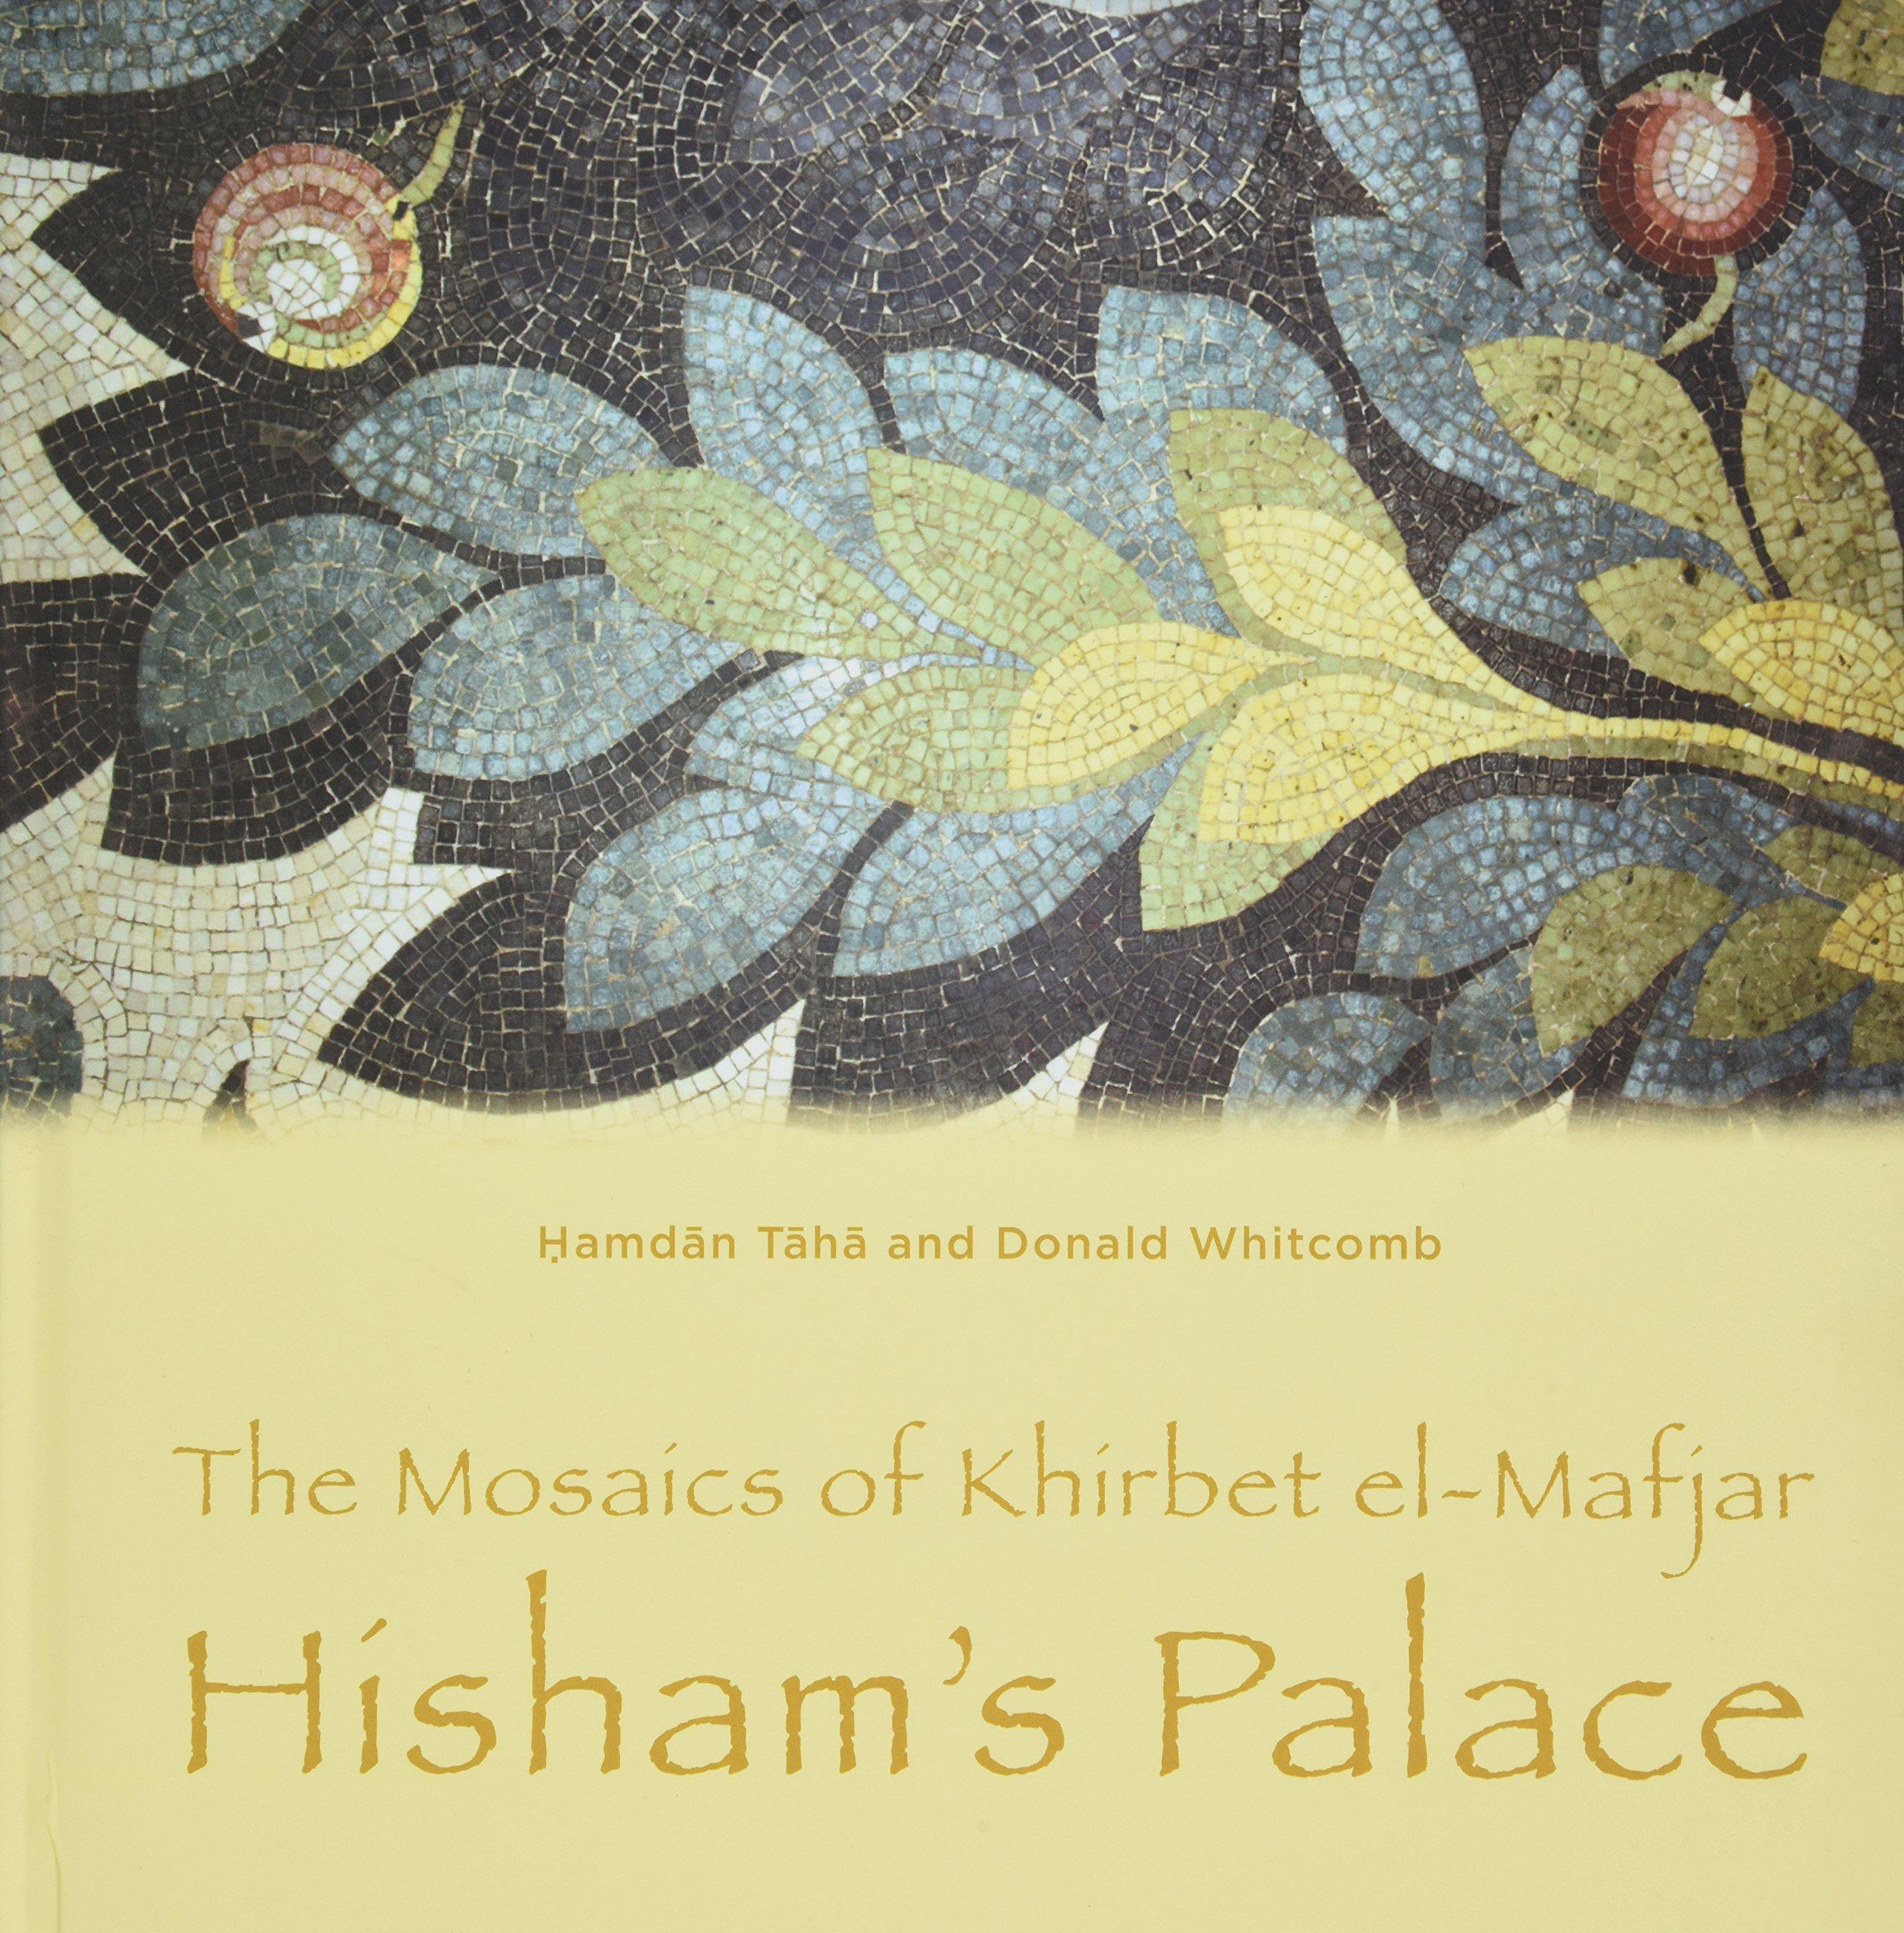 The Mosaics of Khirbet el-Mafjar: Hisham's Palace